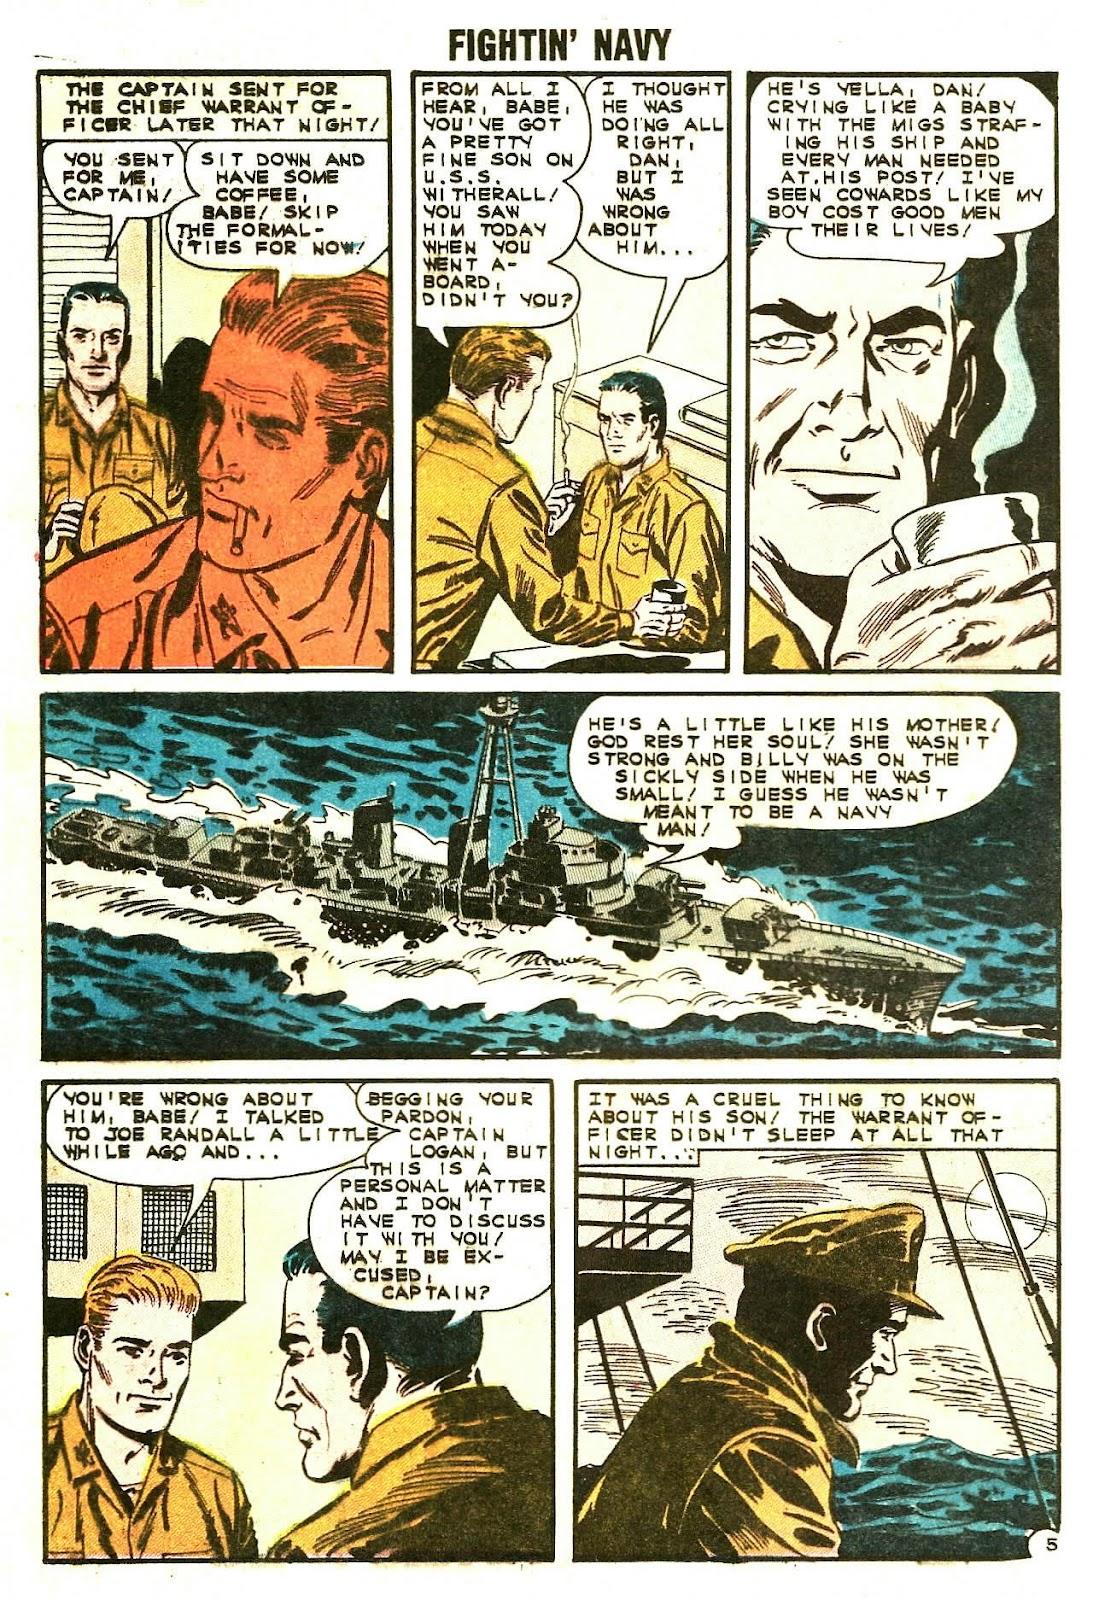 Read online Fightin' Navy comic -  Issue #107 - 12